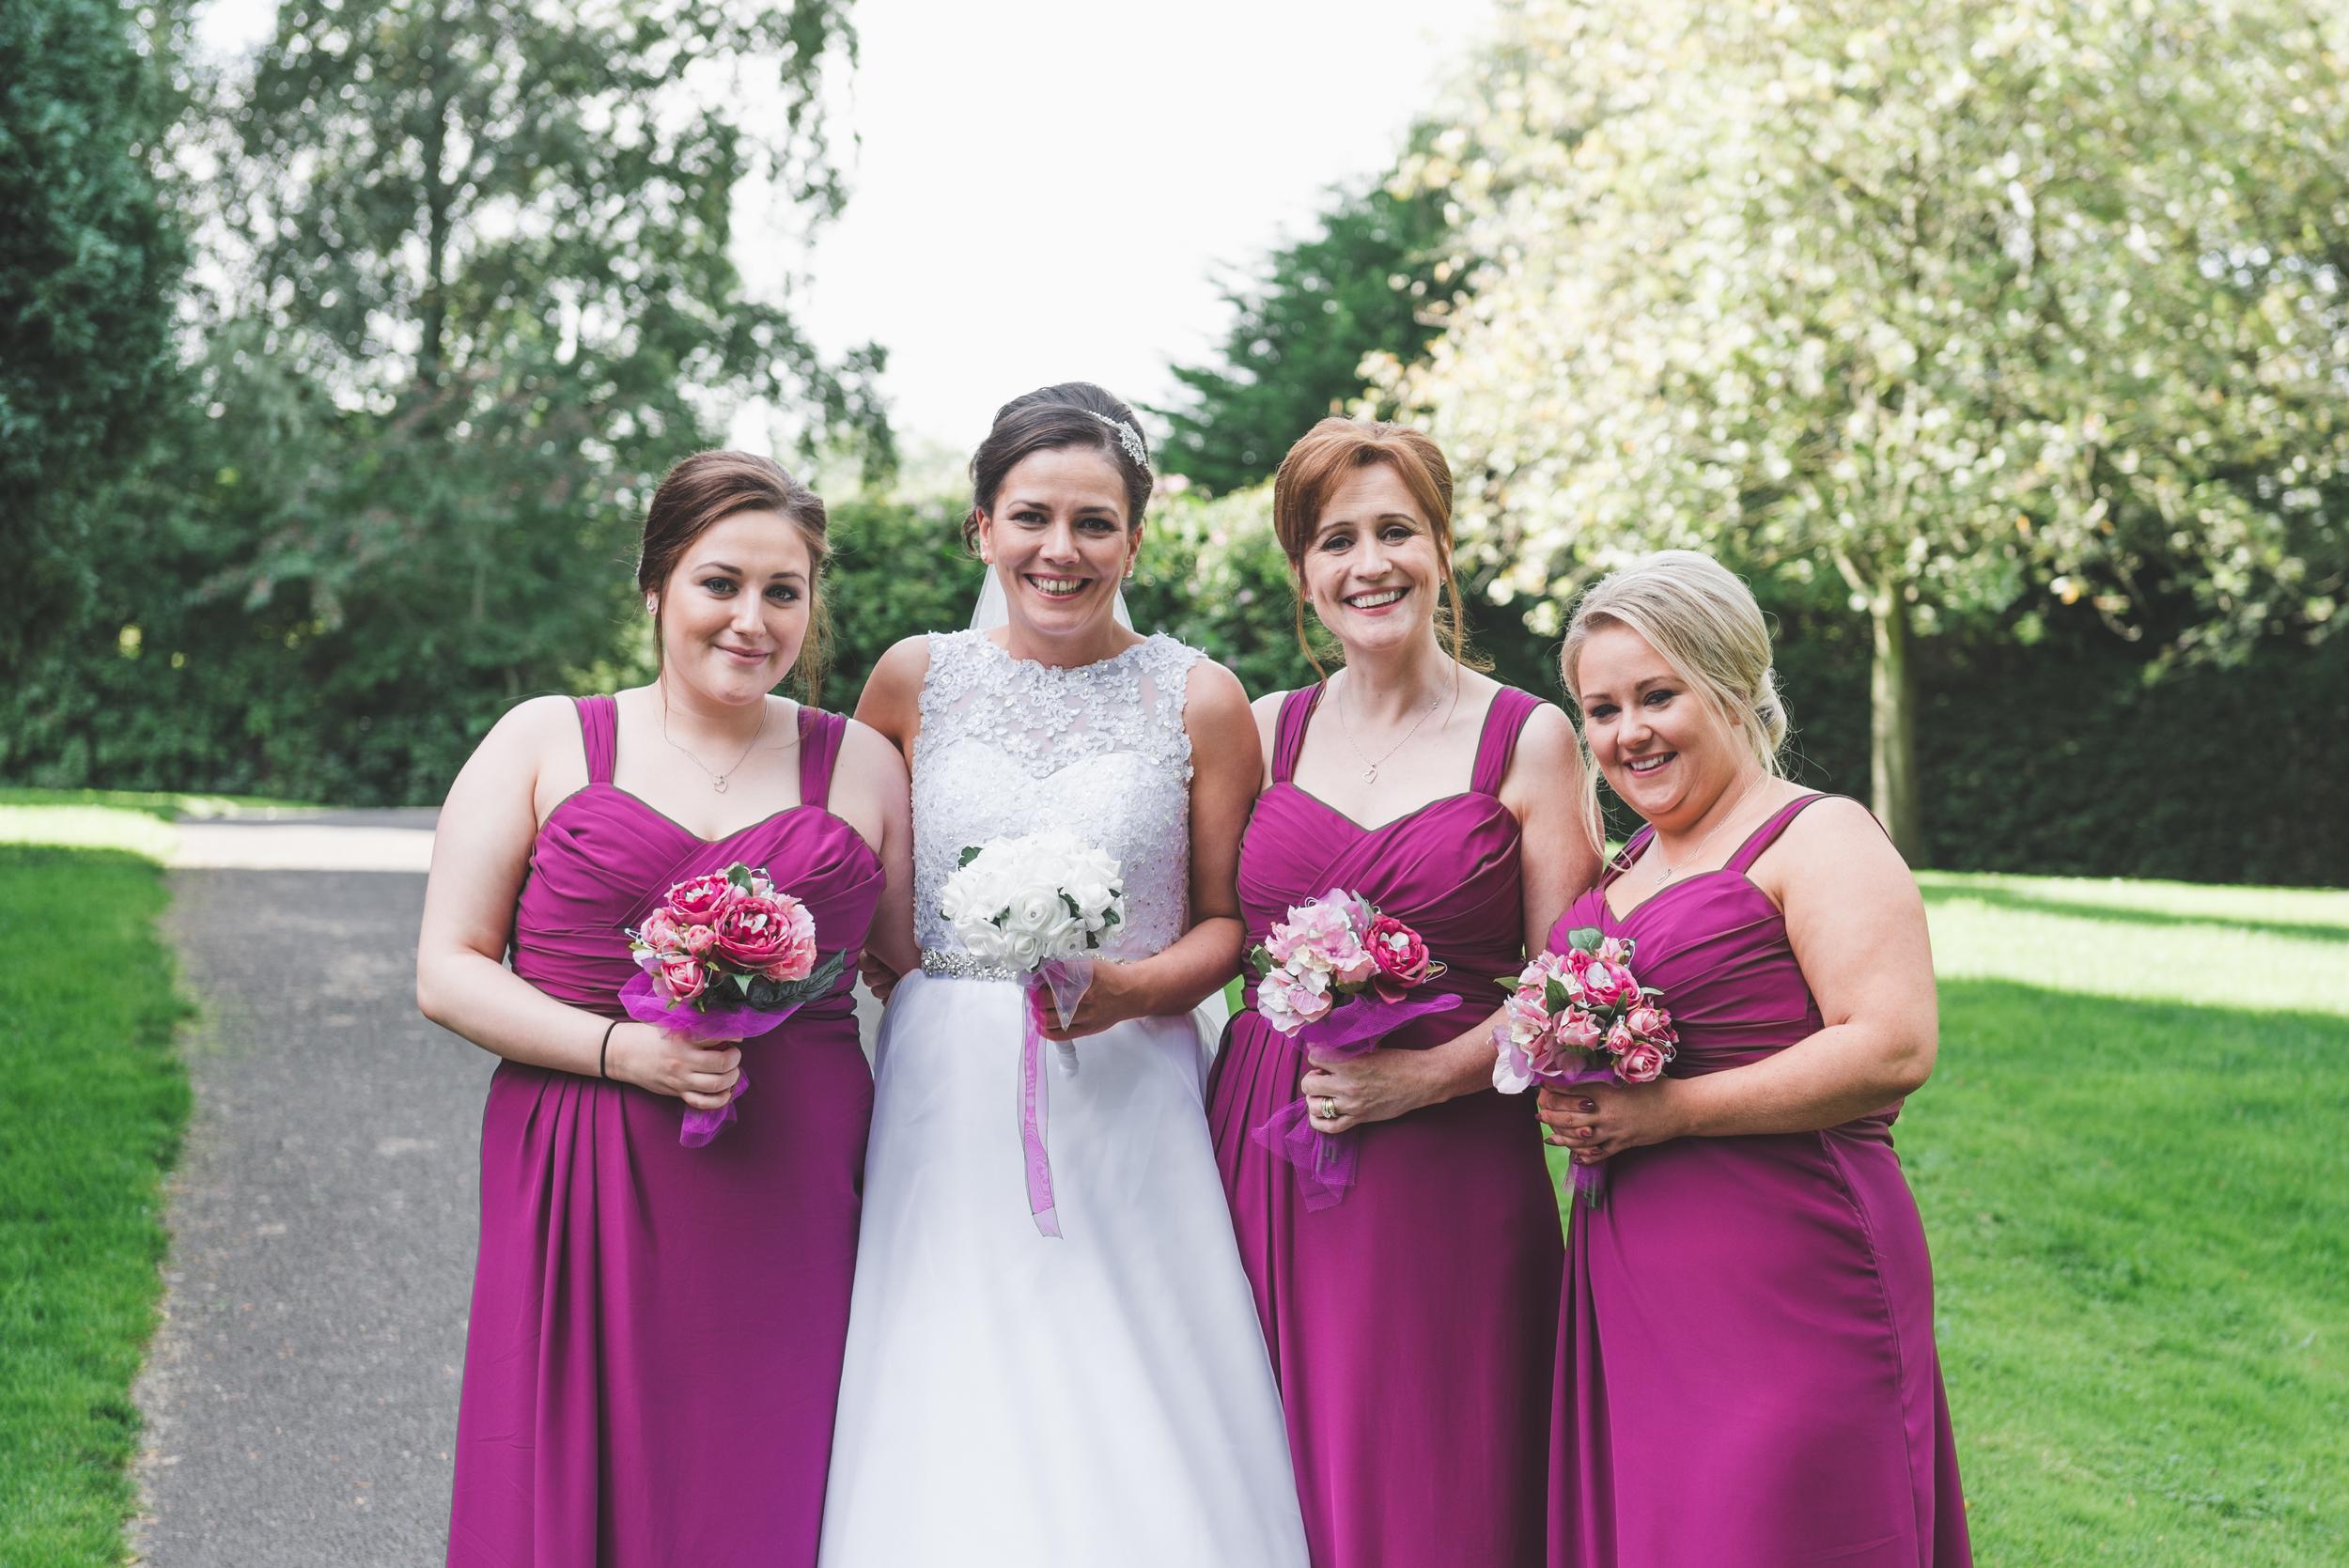 Belfast_Wedding_Photographer_Purephotoni_Musgrave_Park_Bride_Bridesmaids